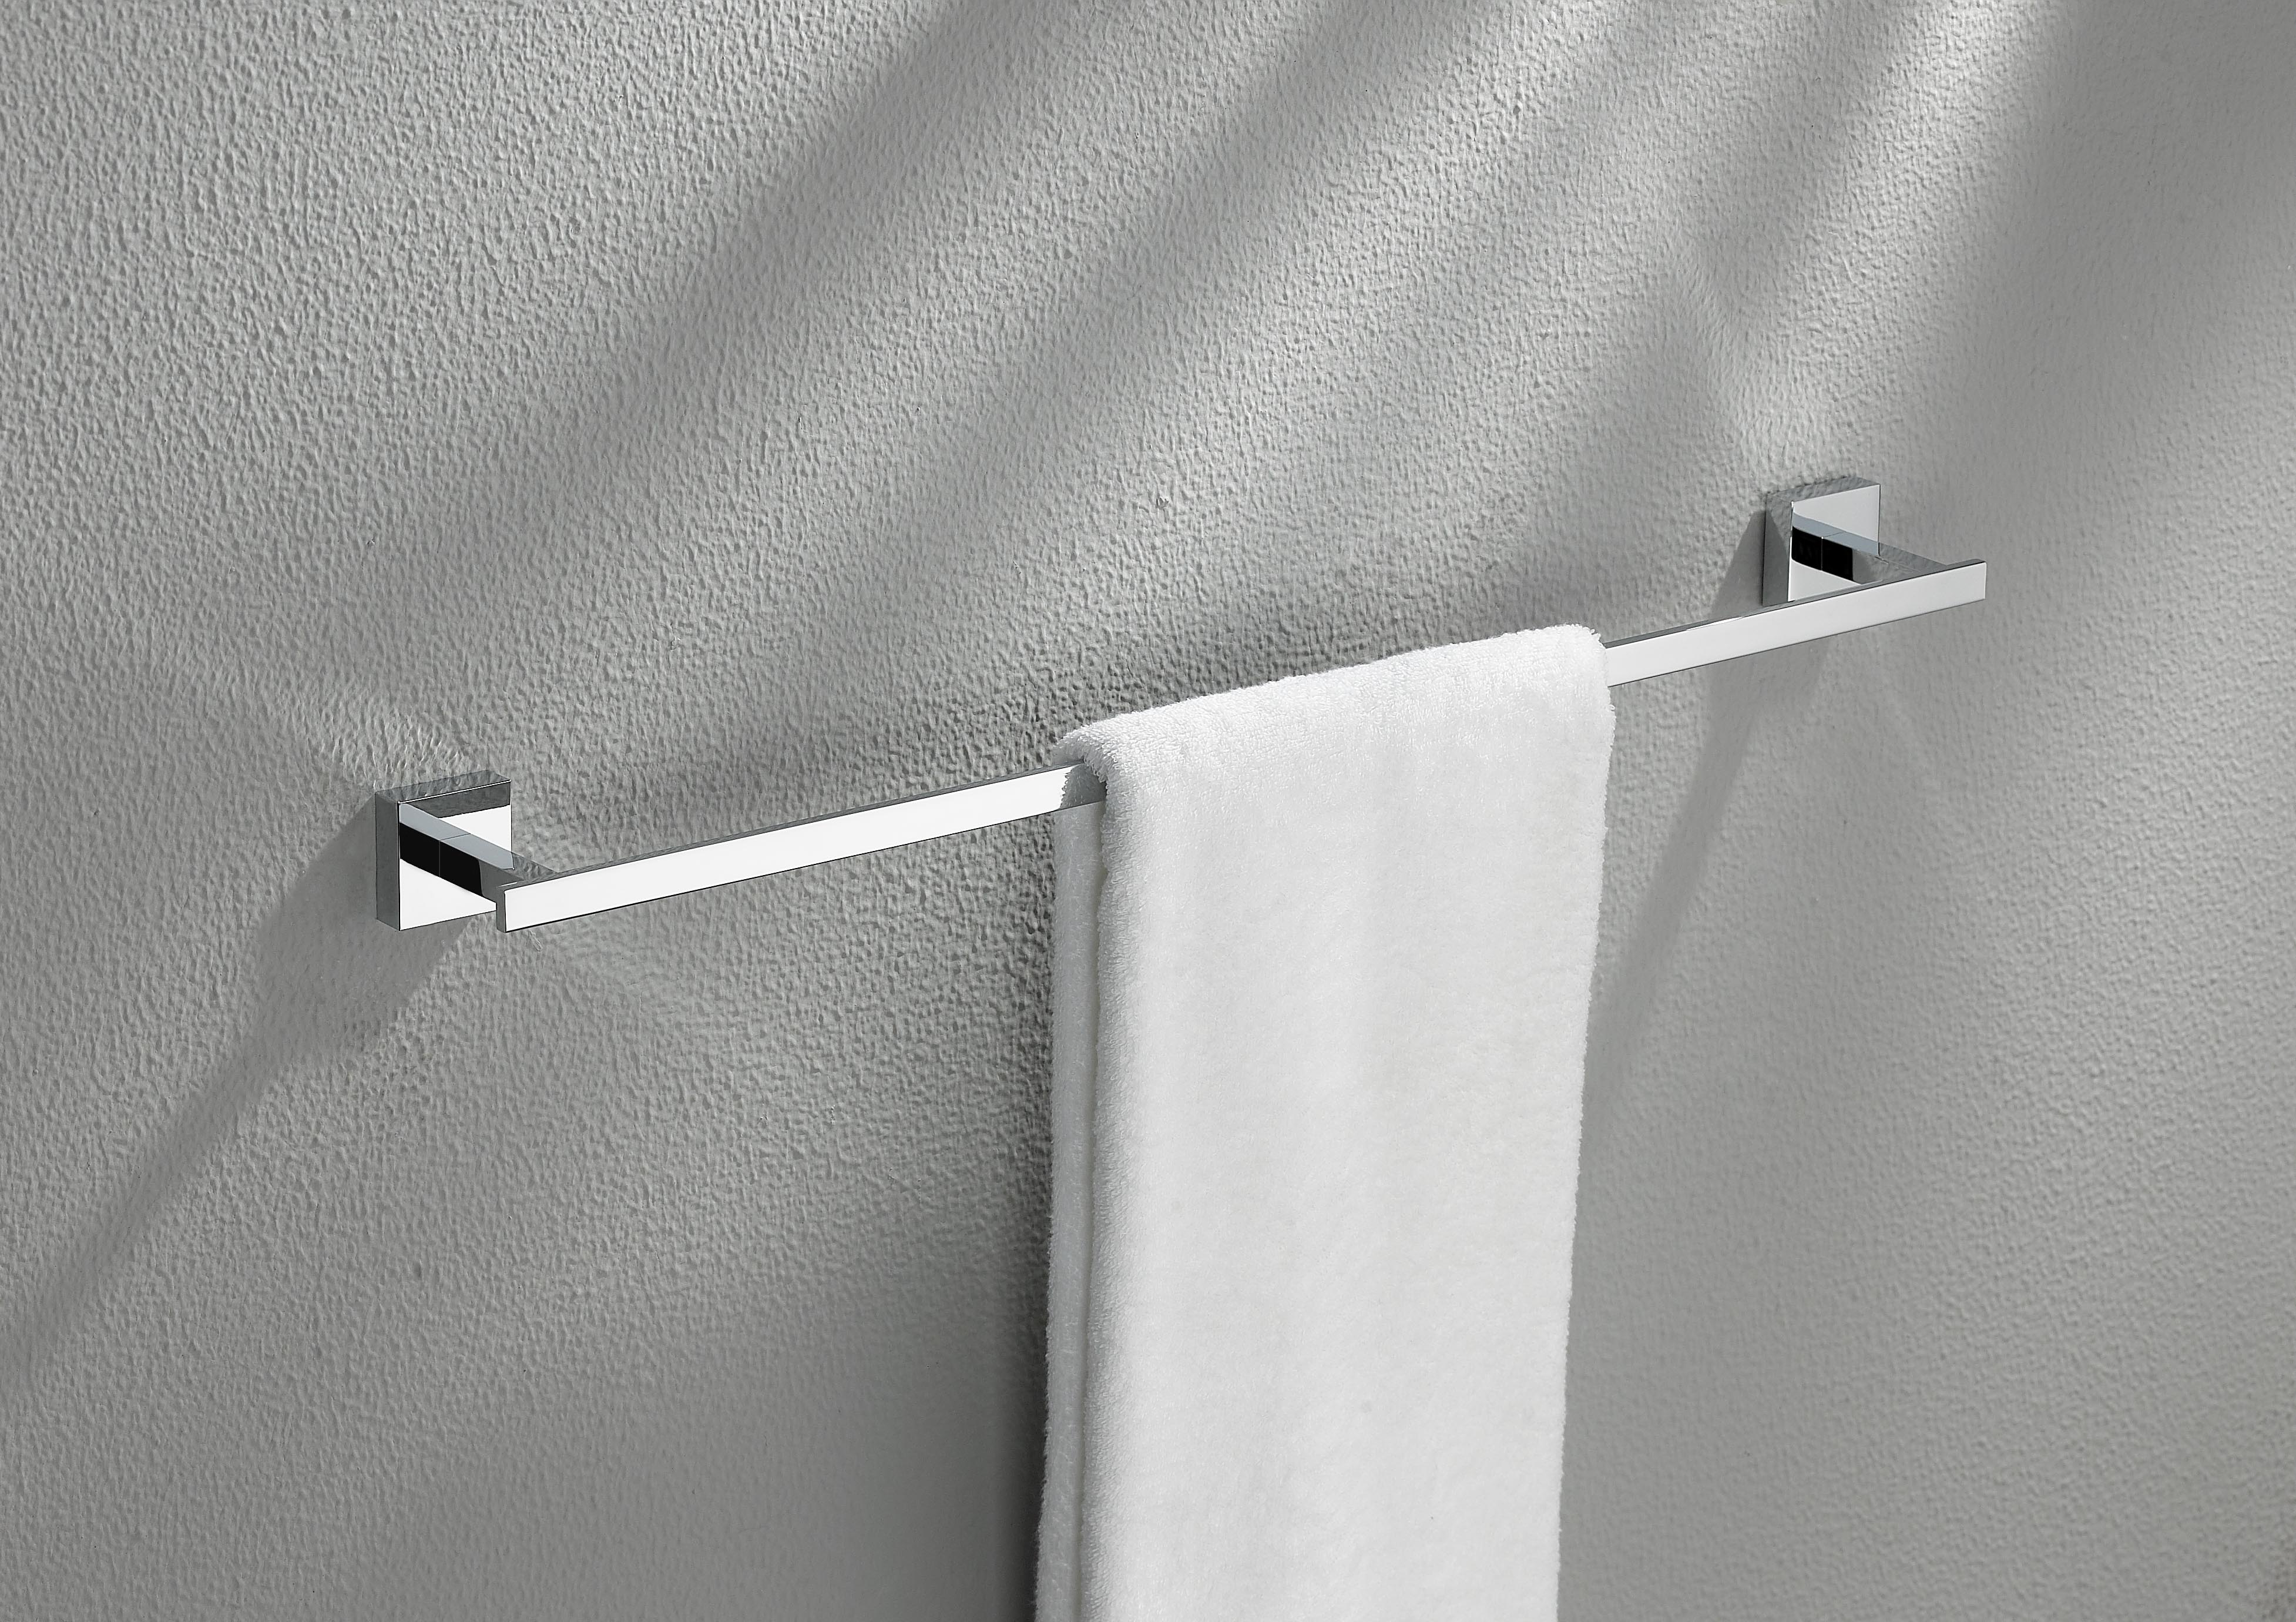 CA-Serie Handtuchhalter